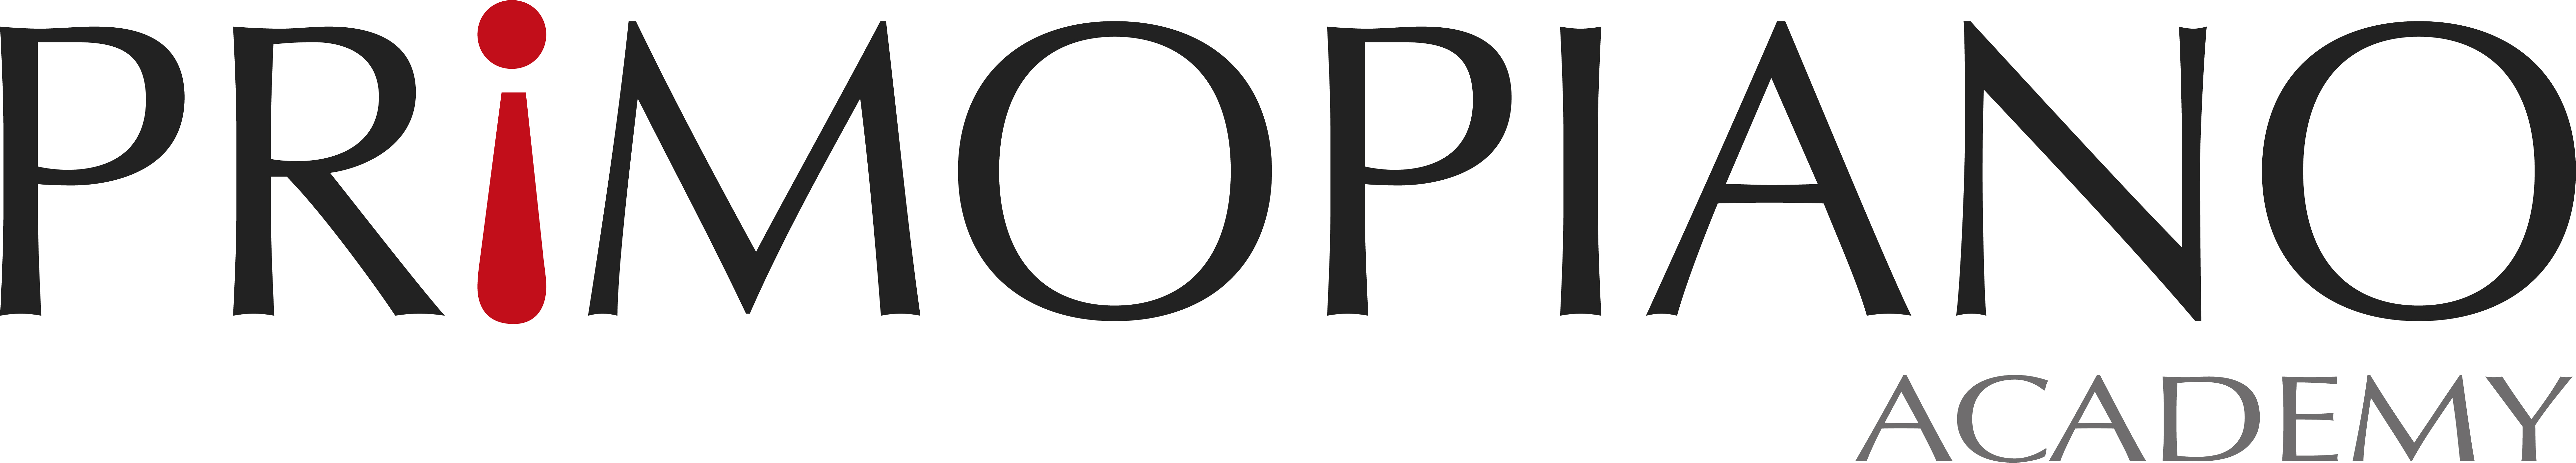 Primopiano Academy Logo